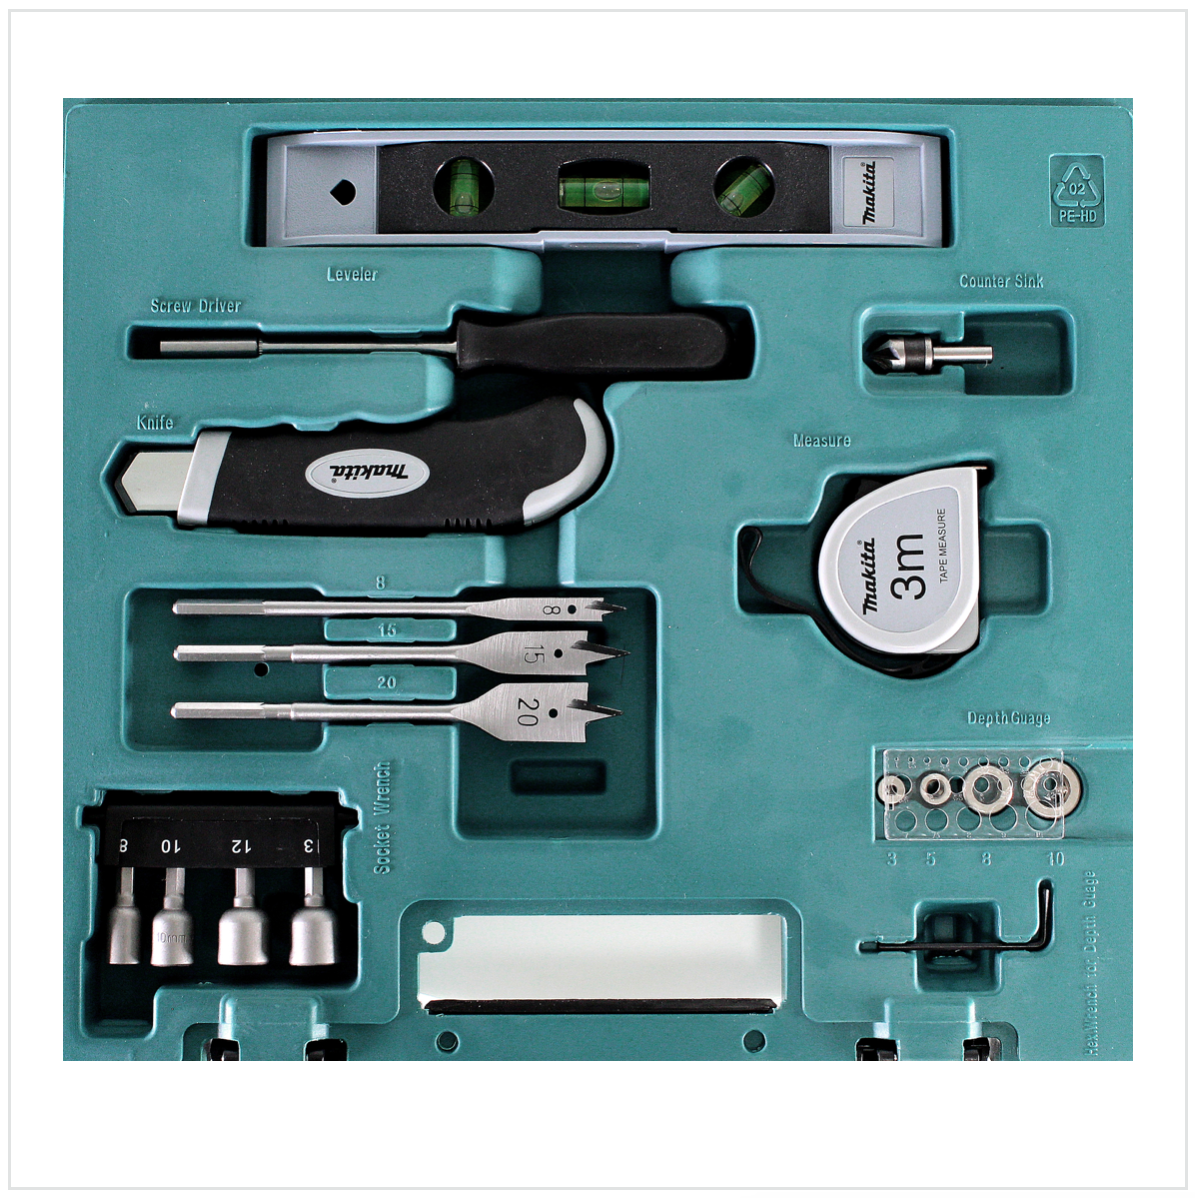 makita 104 tlg bit bohrer und zubeh r set d 31778 im koffer elektrowerkzeug zubeh r bit bohrer. Black Bedroom Furniture Sets. Home Design Ideas